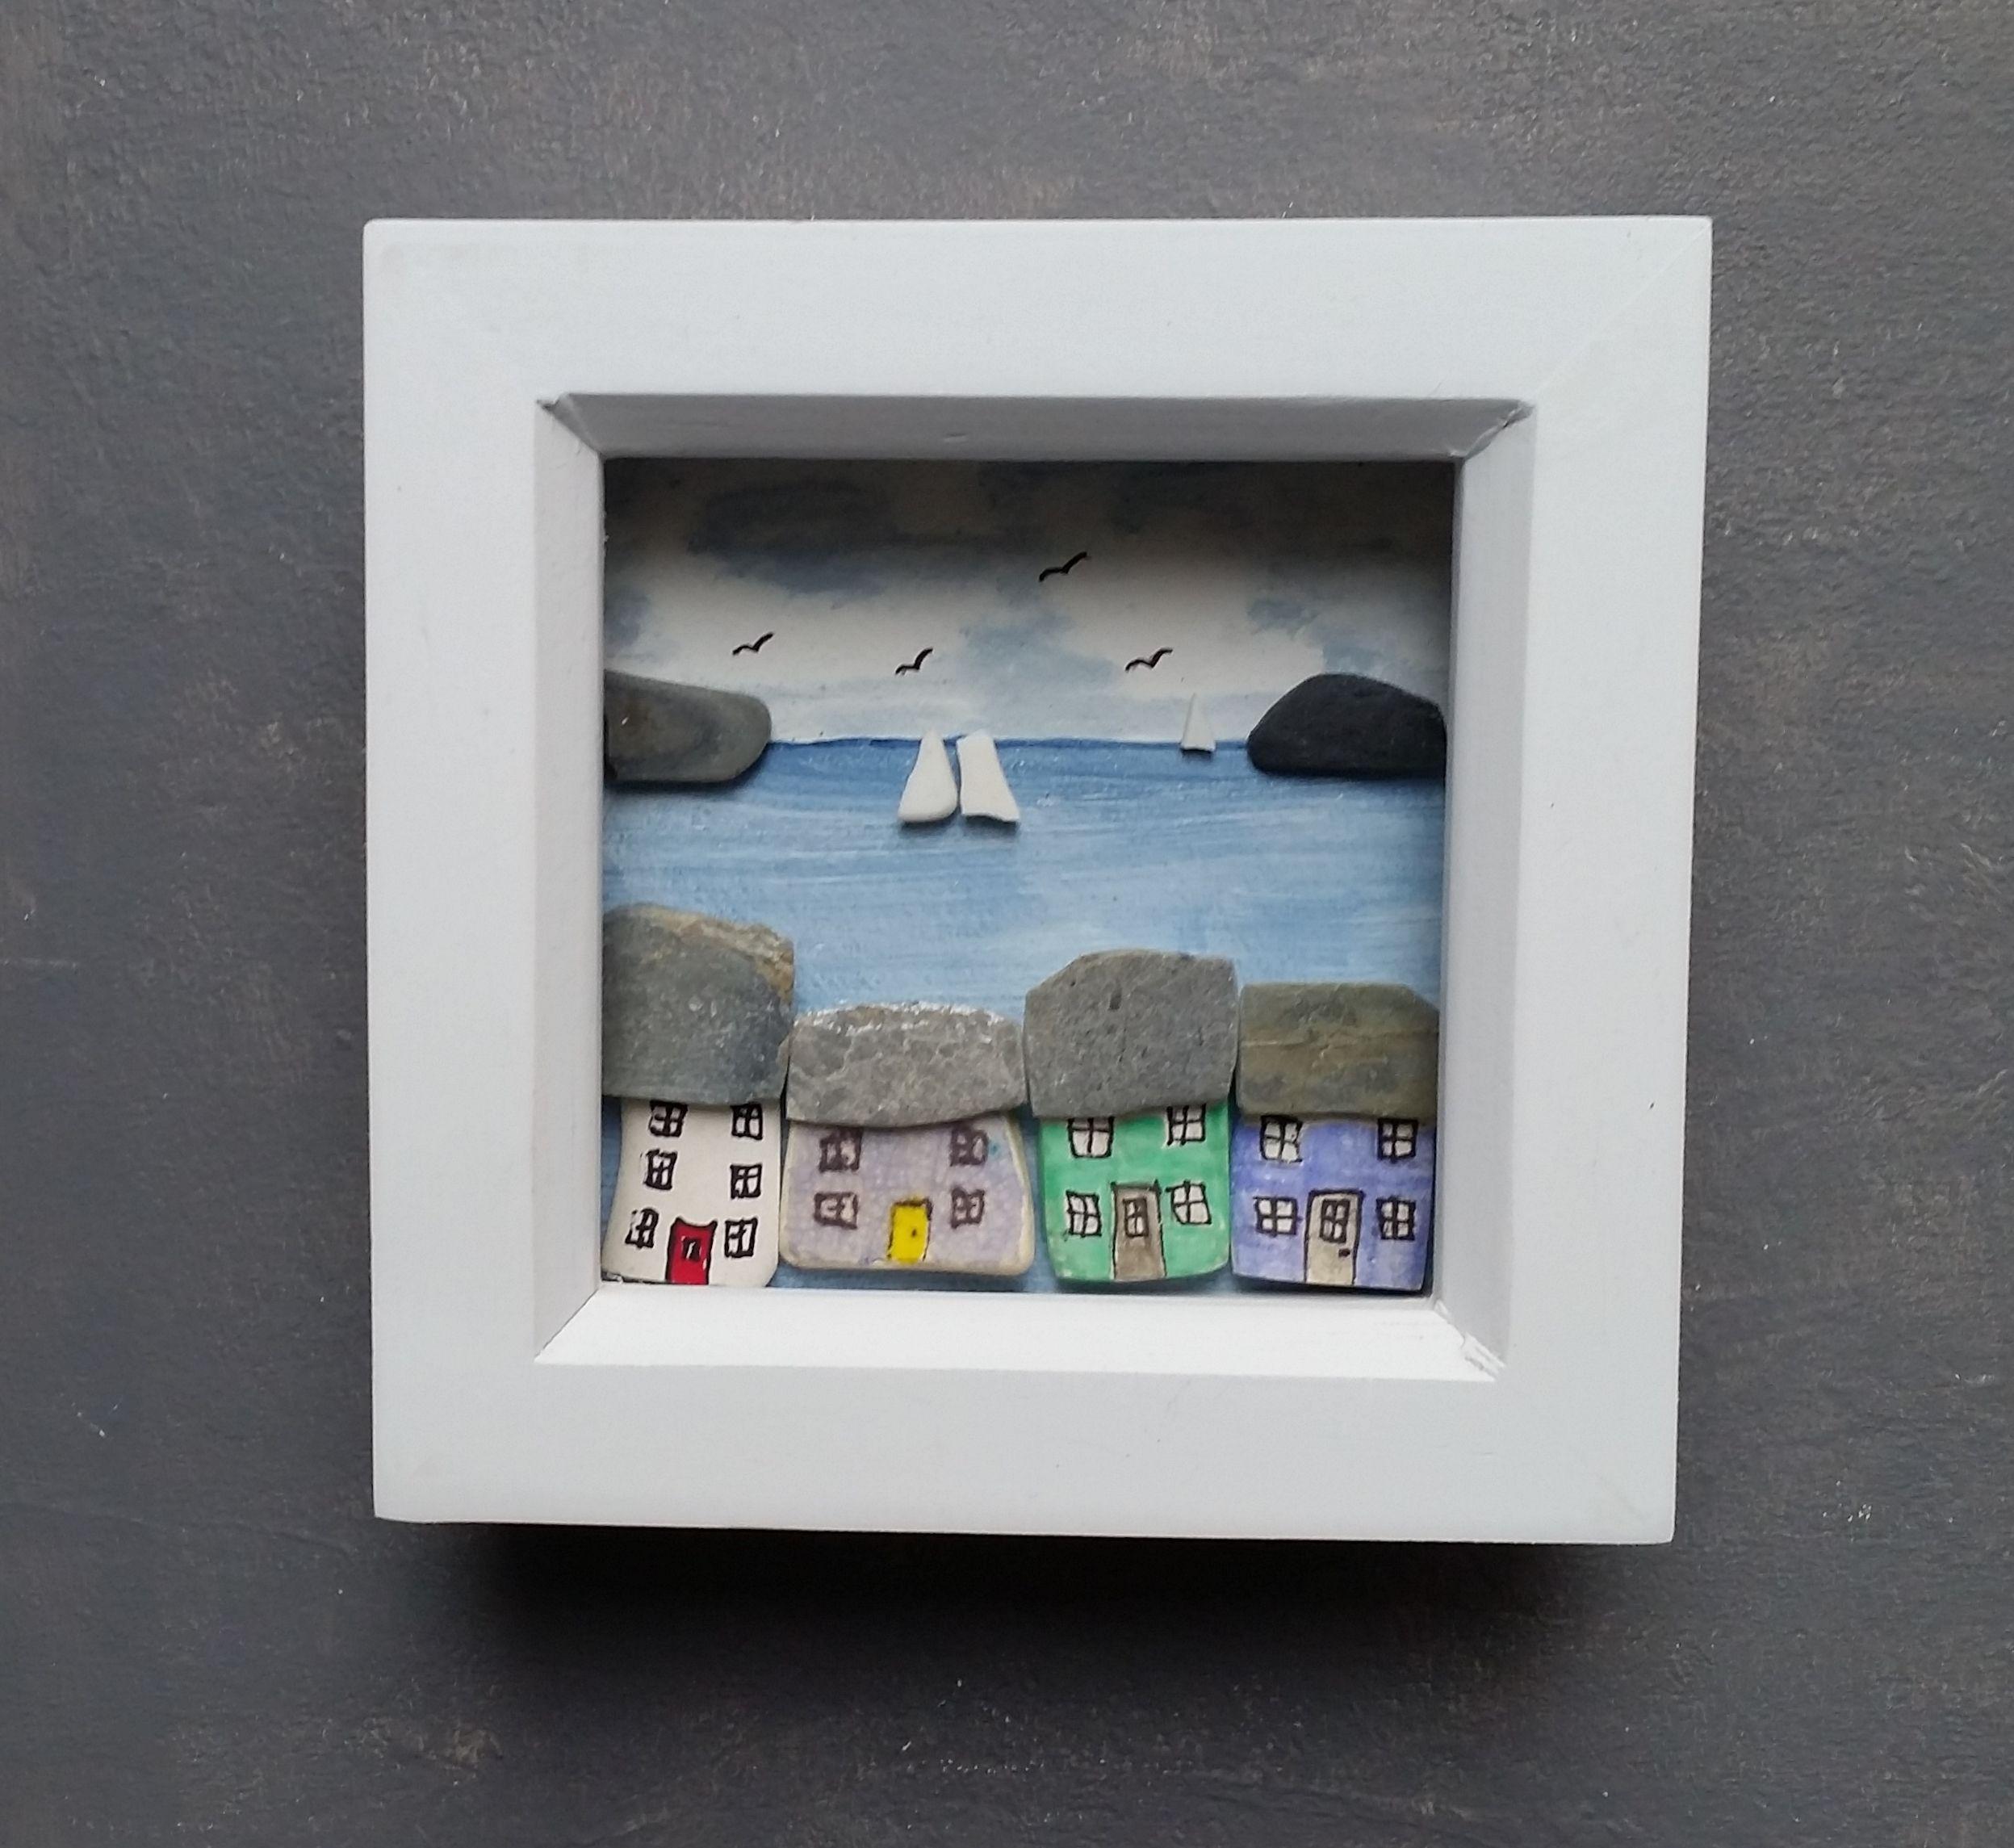 Nautical Wall Decor Mix And Match Coastal Scenes In Mini Frames Beach House Wall Art Nautical Wall Decor Sea Glass Art Framed Wall Art